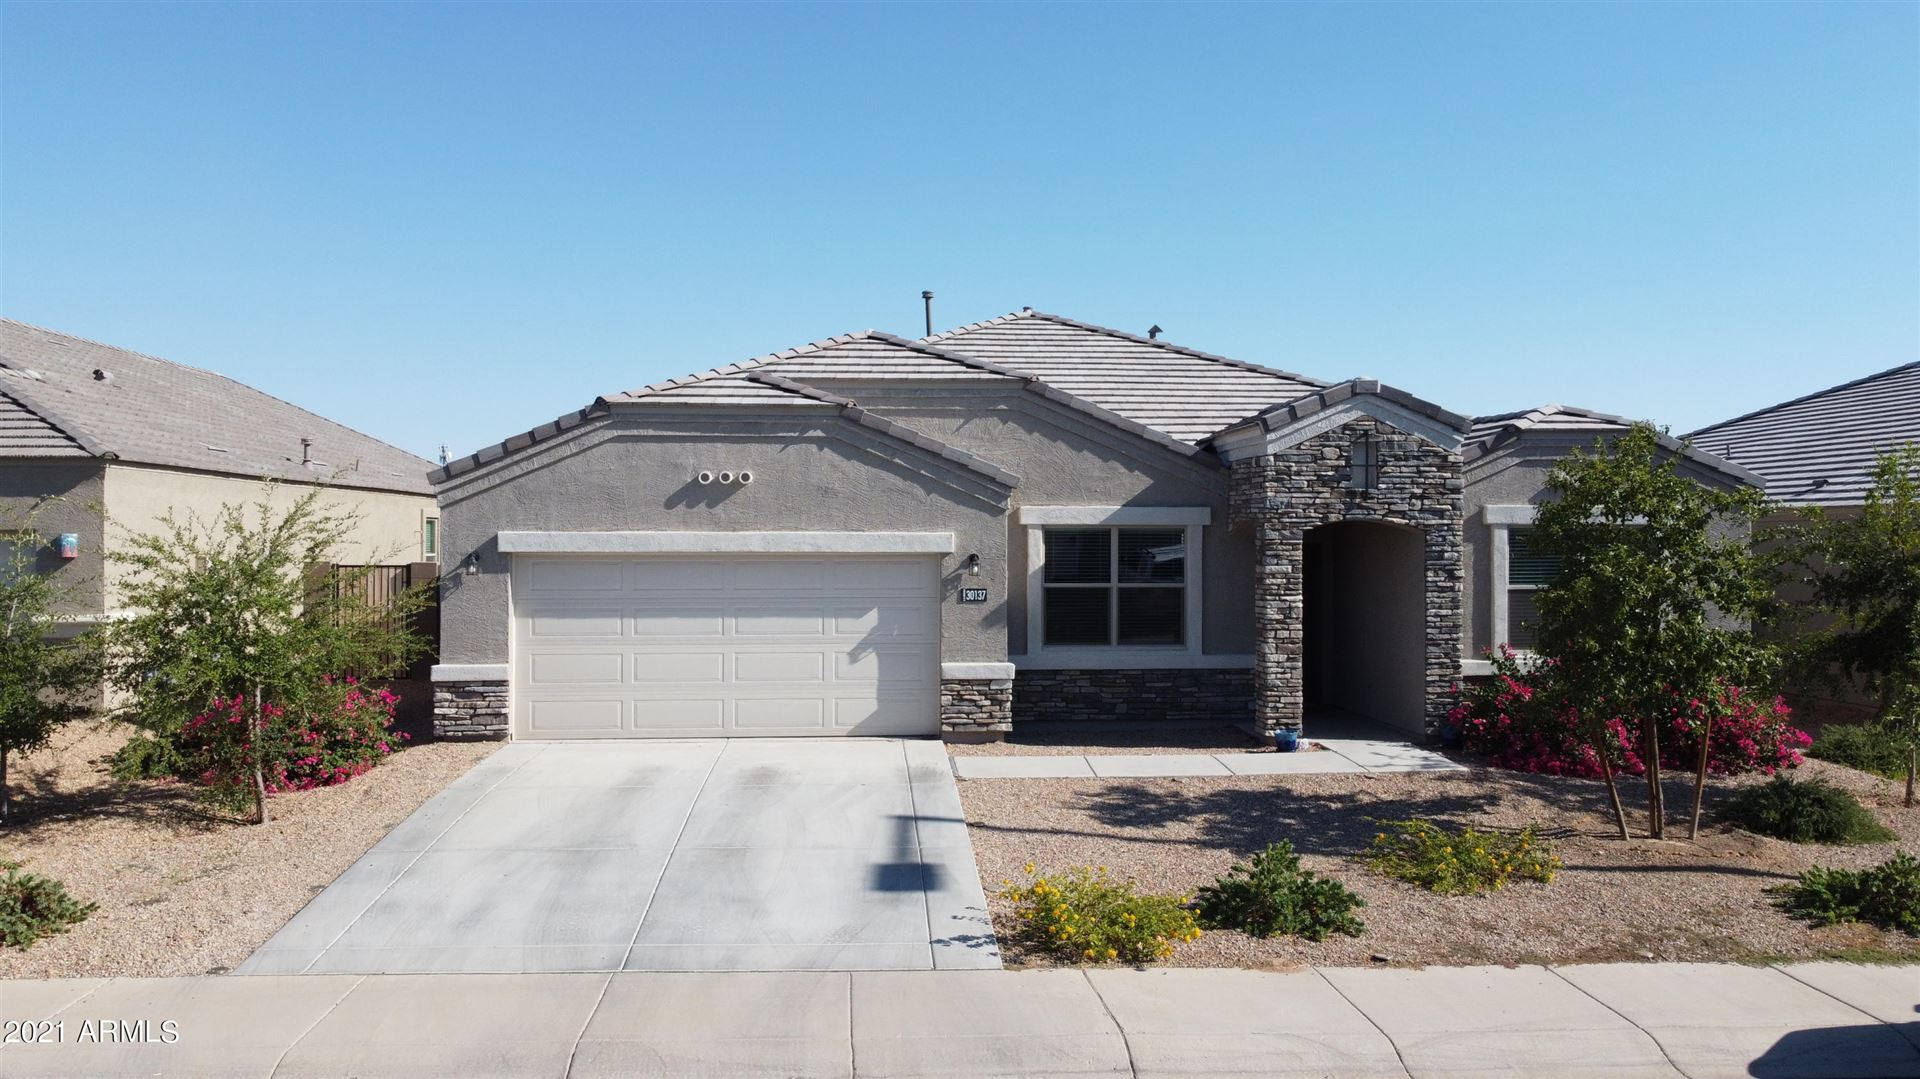 Photo of 30137 W FAIRMOUNT Avenue, Buckeye, AZ 85396 (MLS # 6268500)